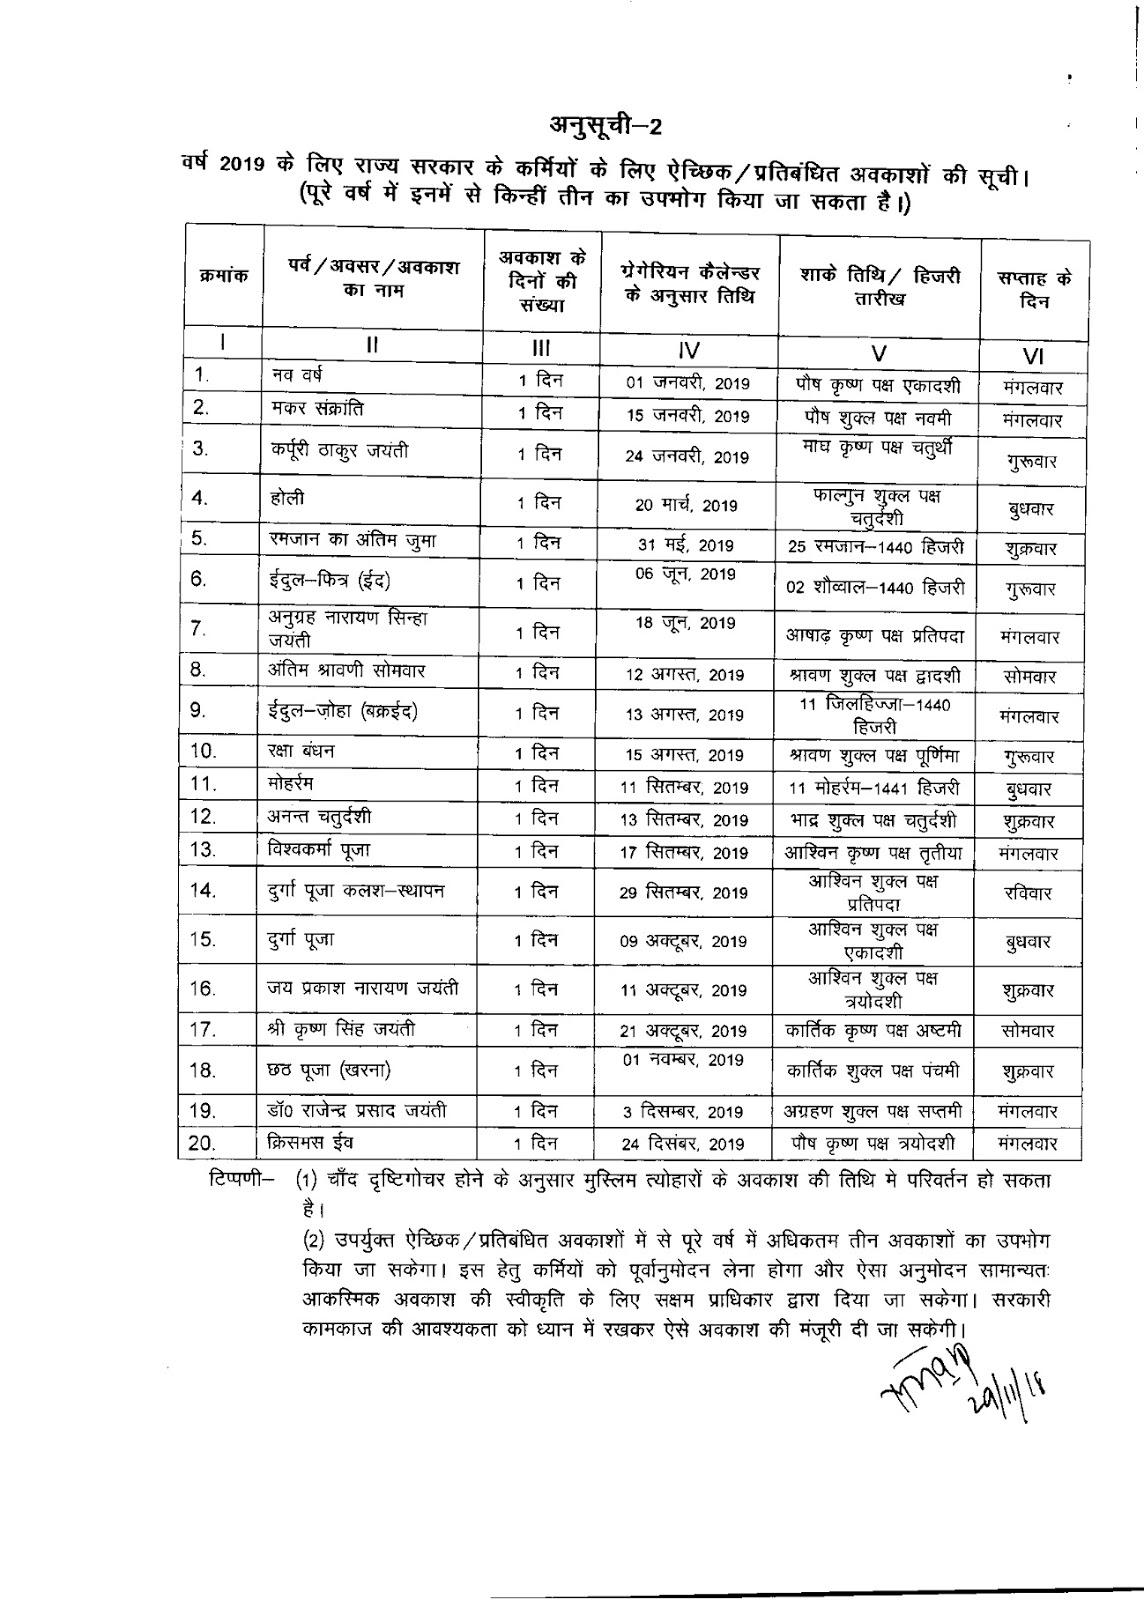 Bihar Government Calendar 2019 #educratsweb regarding Bihar Sarkar Callender